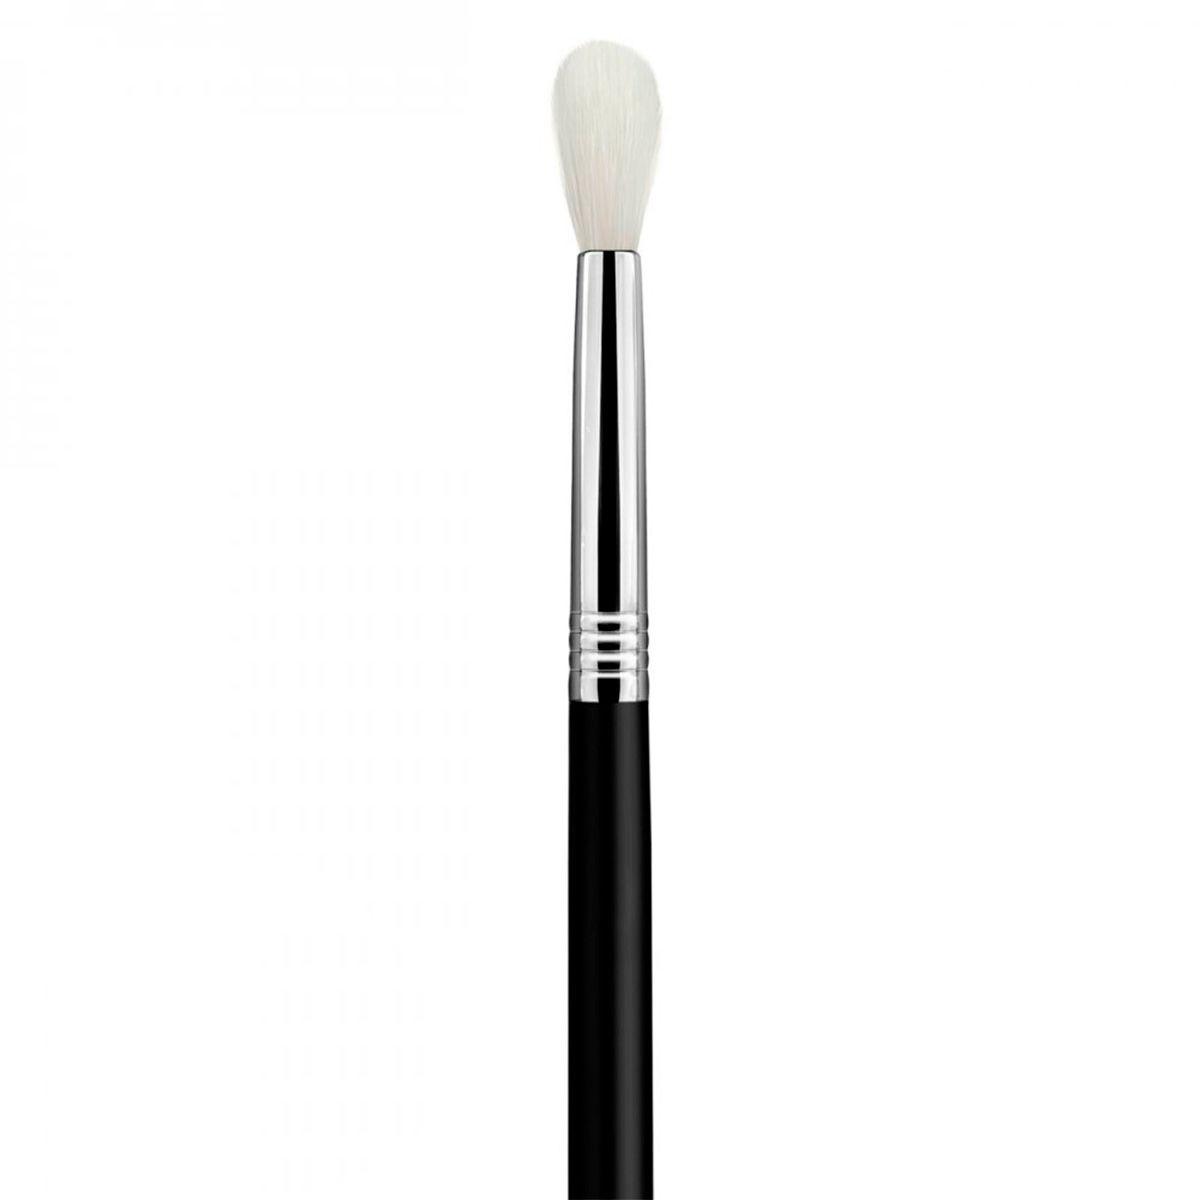 Pincel de Esfumar O129 Detail Blending Brush Daymakeup